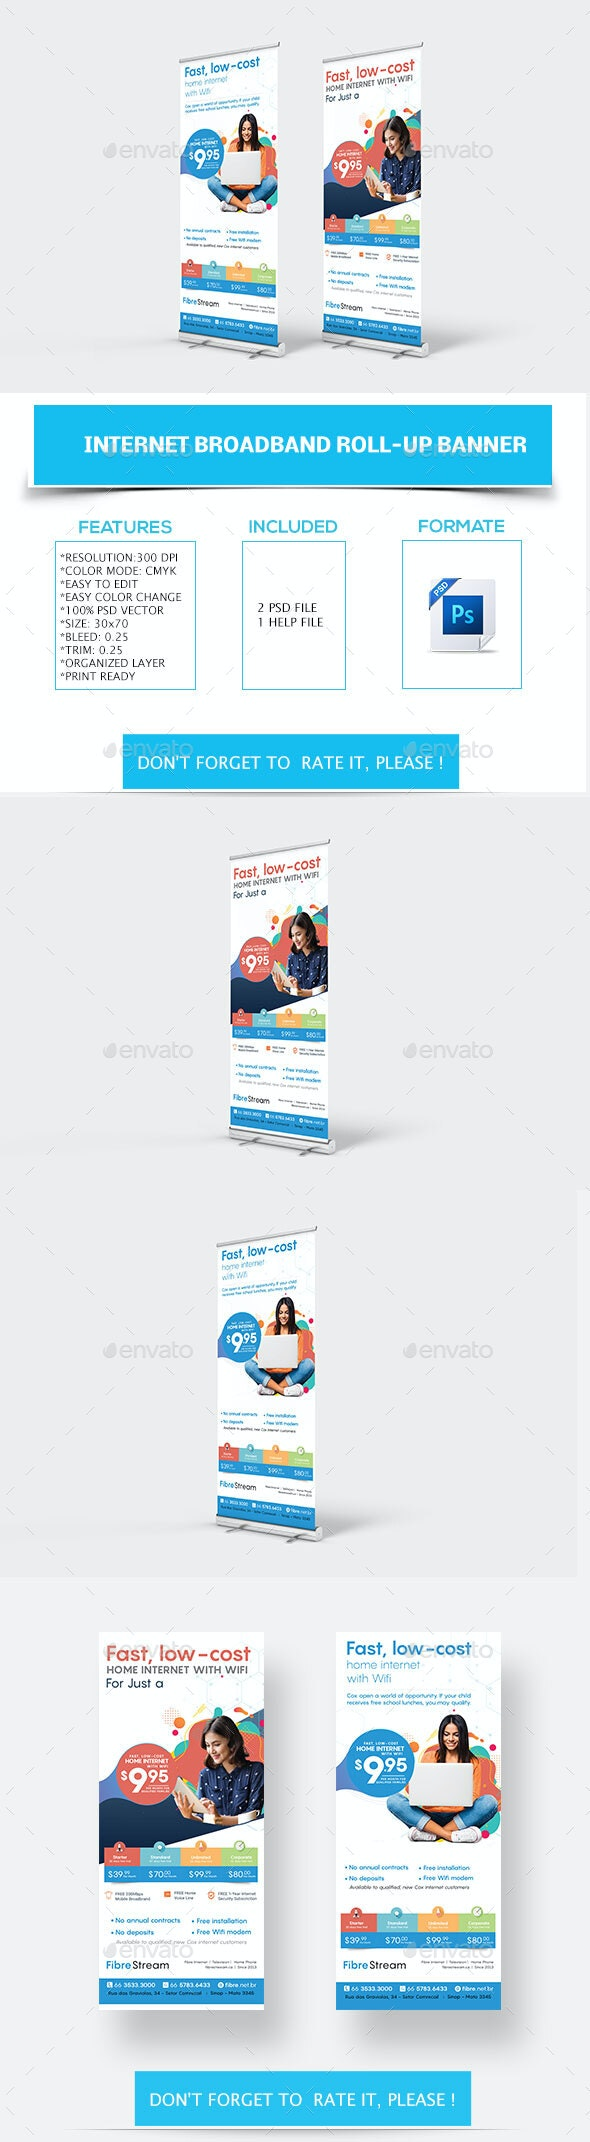 Internet Broadband Promotion Roll-up Banner - Signage Print Templates